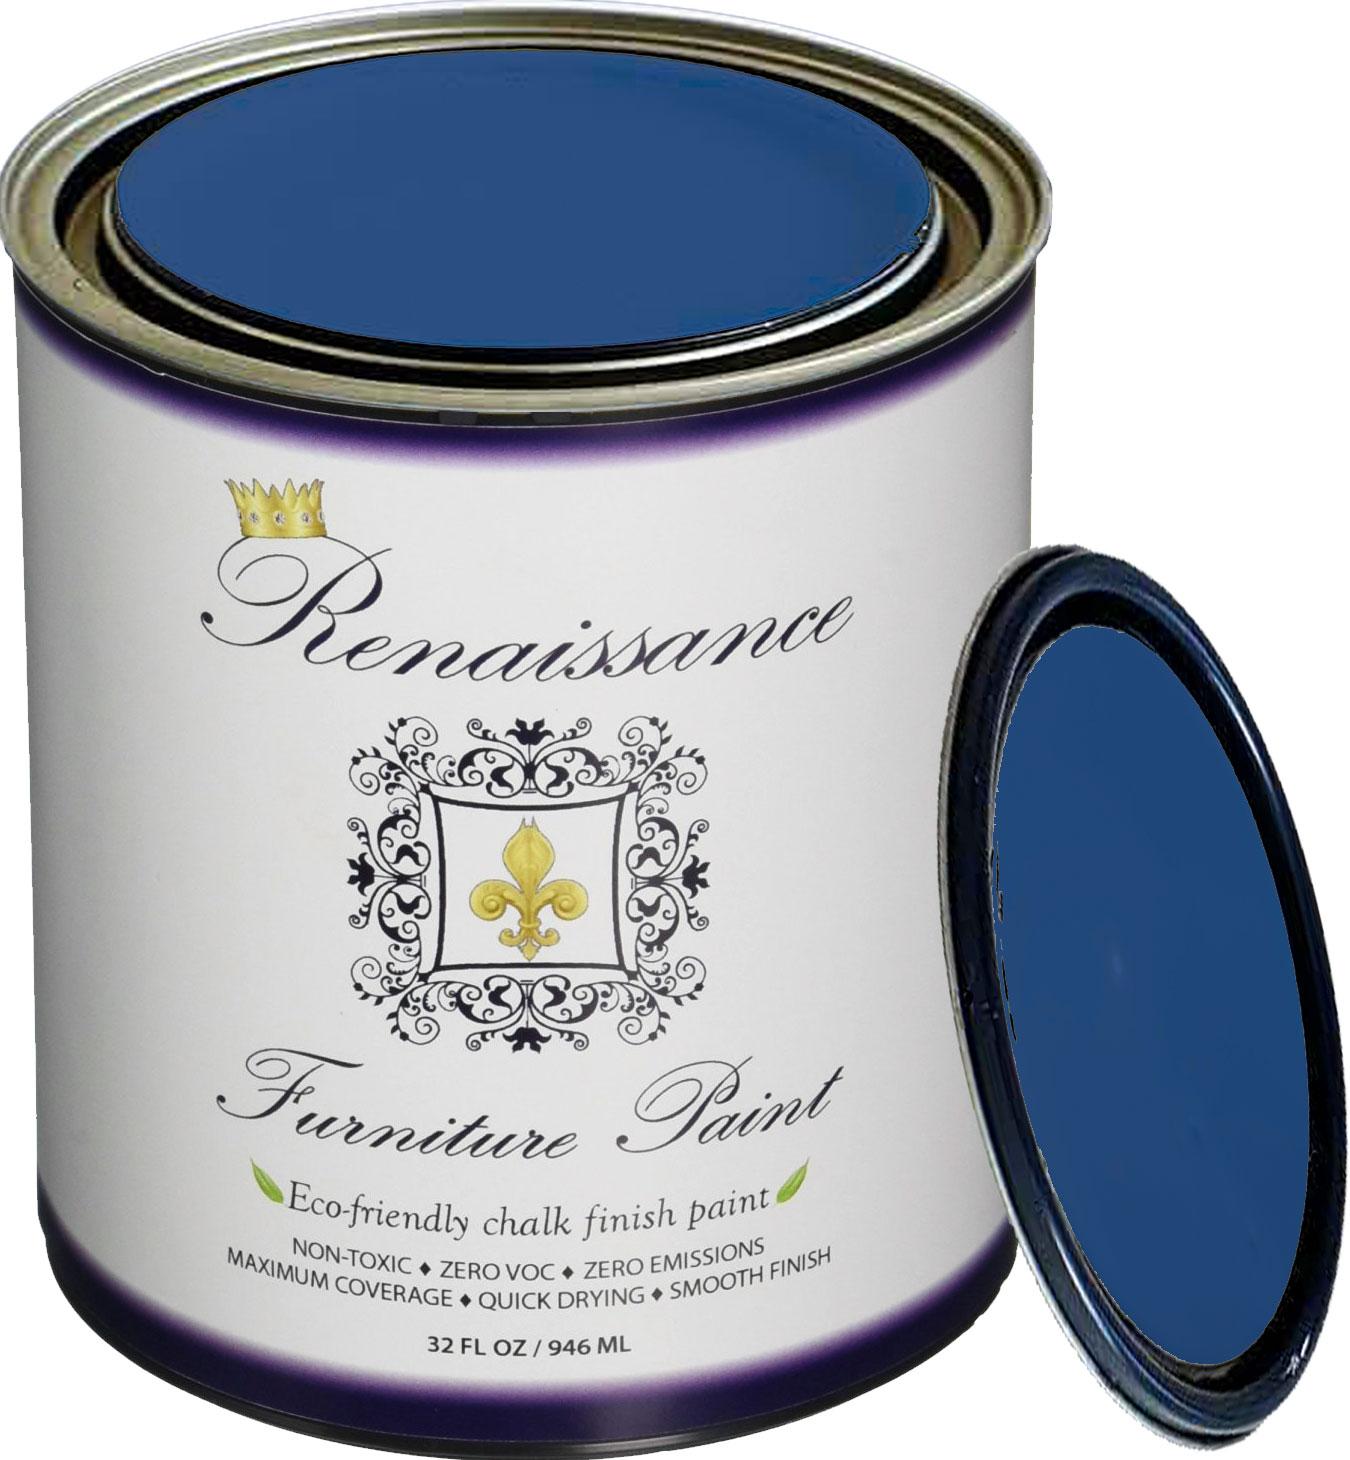 Renaissance Chalk Finish Paint - Chalk Furniture & Cabinet Paint - Non Toxic, Eco-Friendly, Superior Coverage - Ivory Tower (32oz)